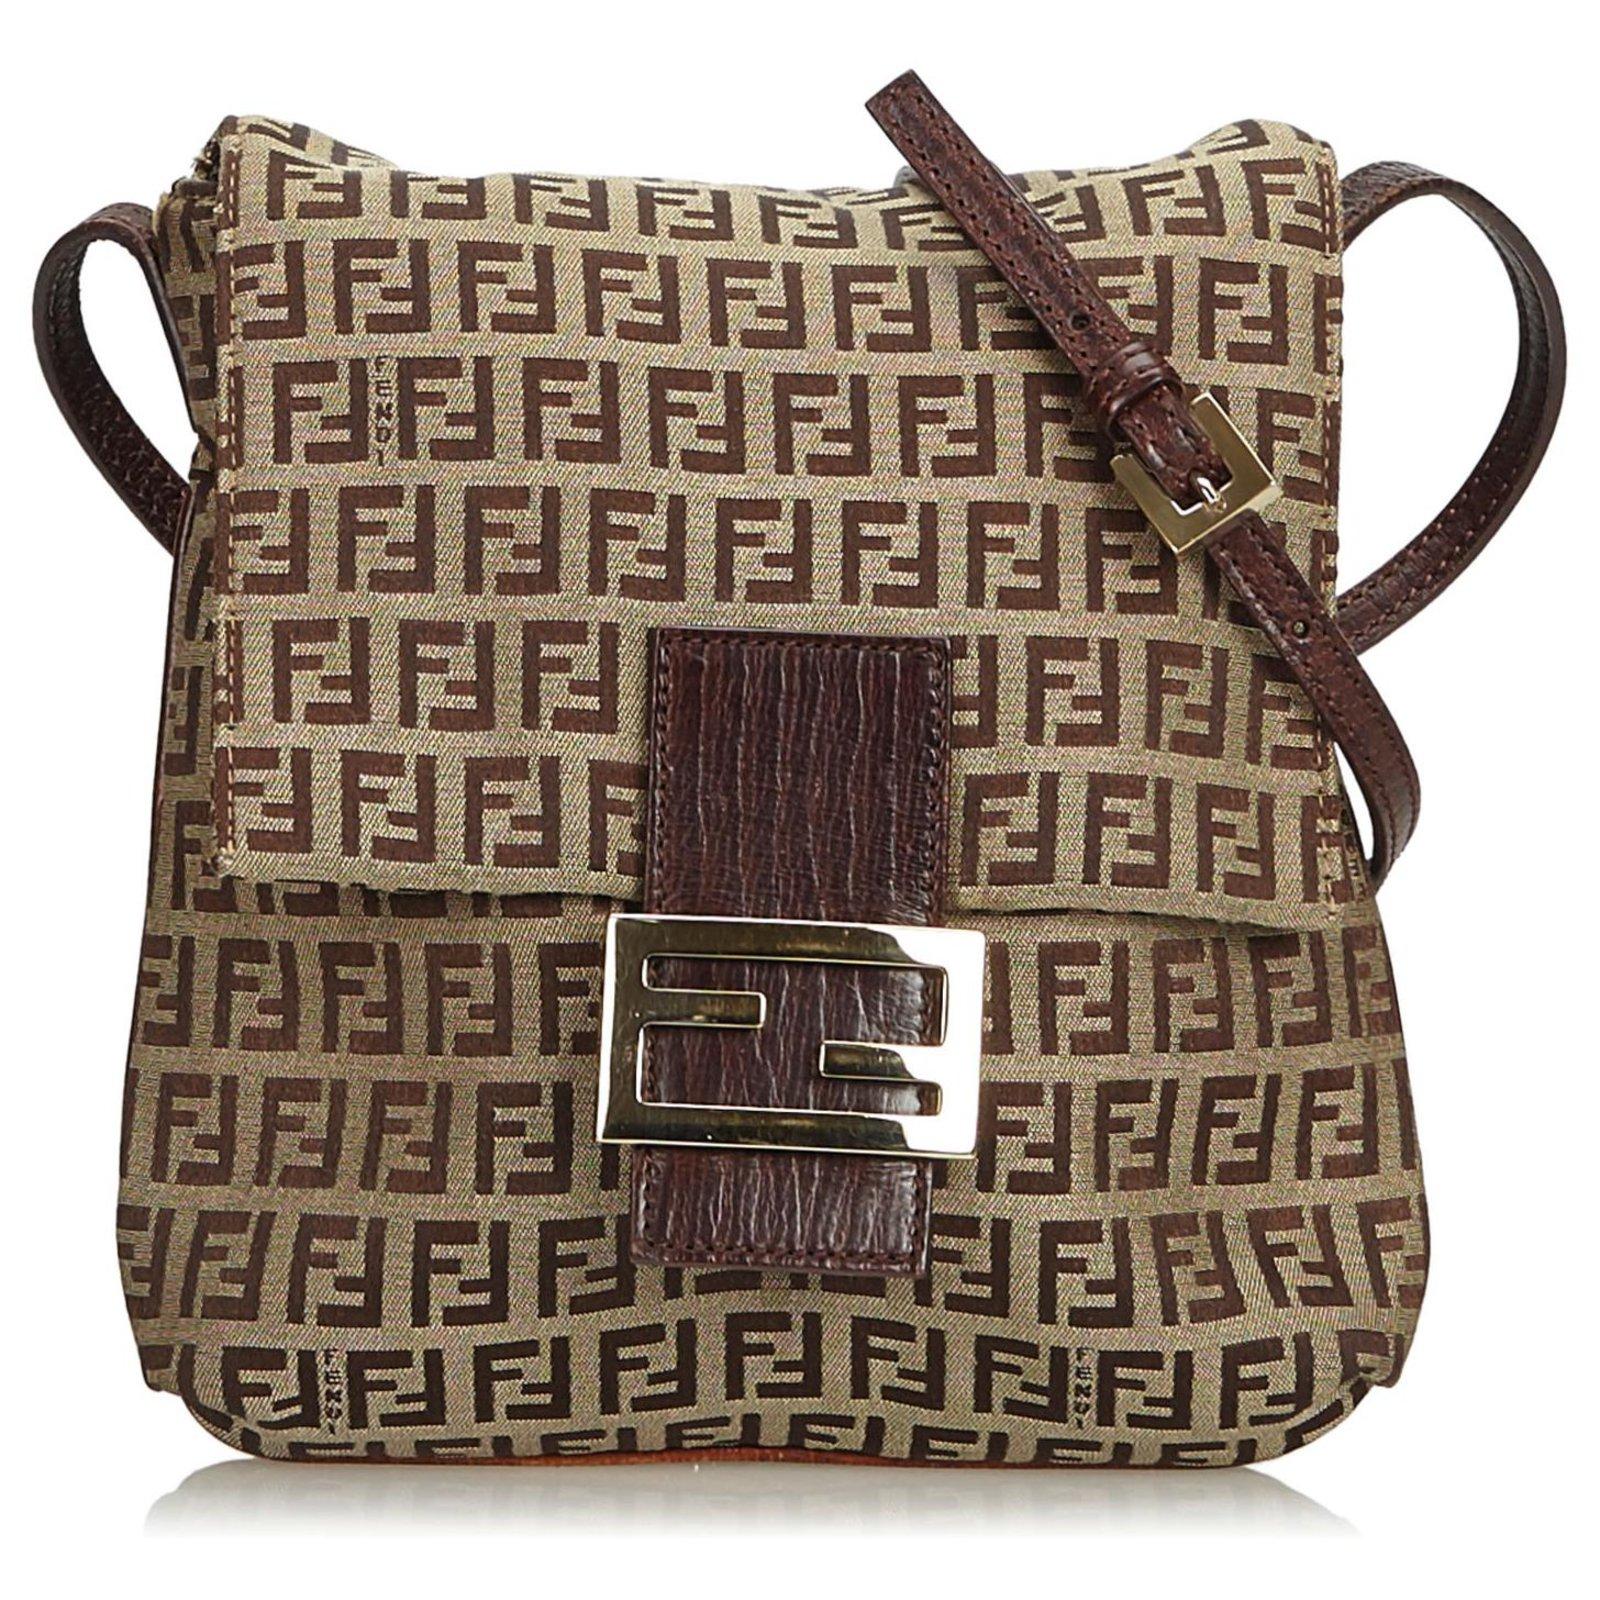 942291b57 Fendi Fendi Brown Zucchino Canvas Crossbody Bag Handbags  Leather,Other,Cloth,Cloth Brown